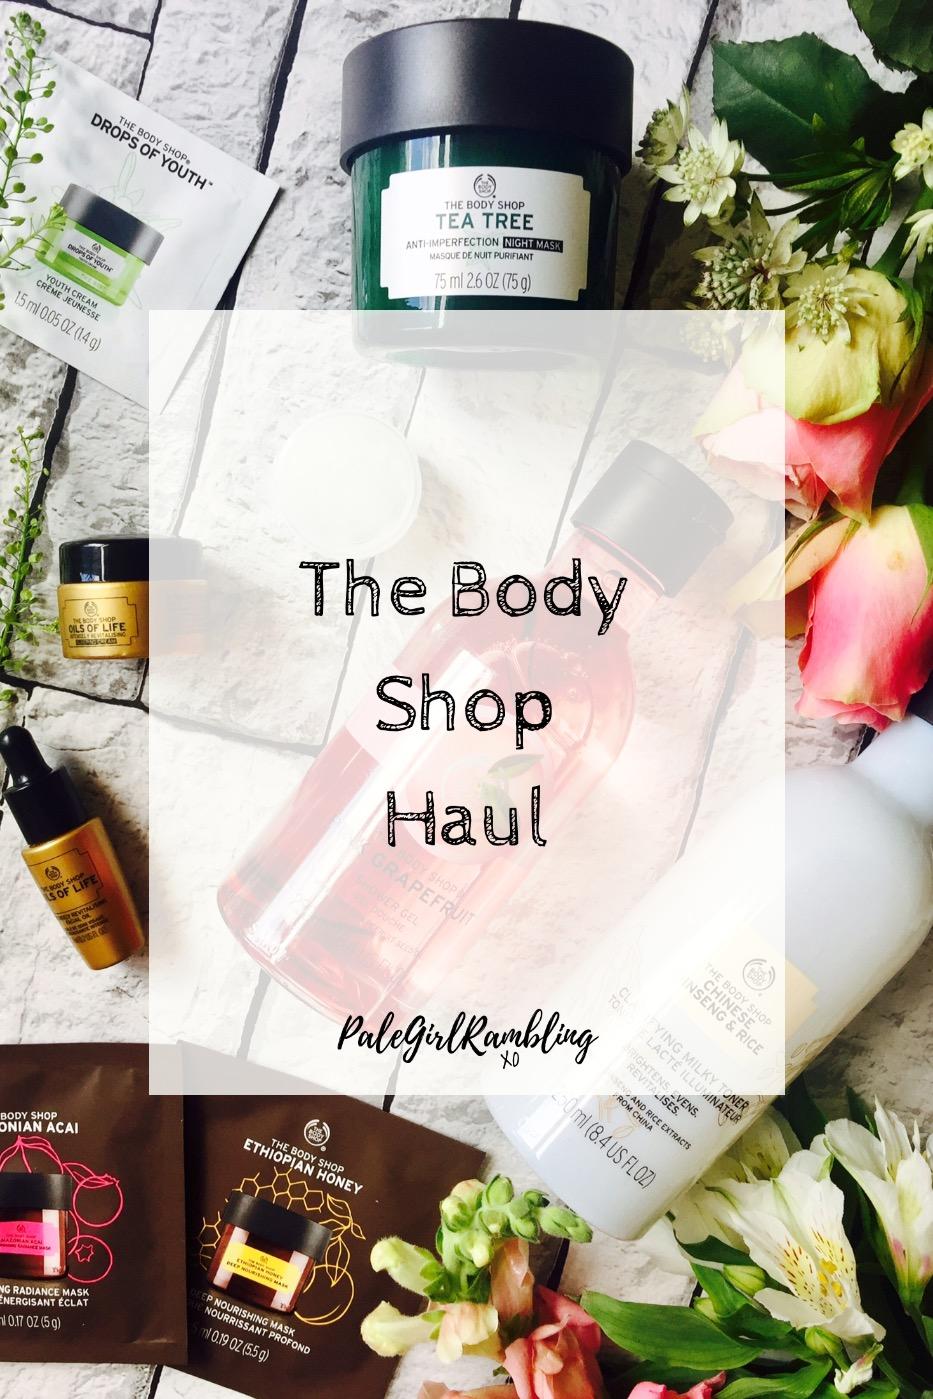 The Body Shop Haul Blogger Event